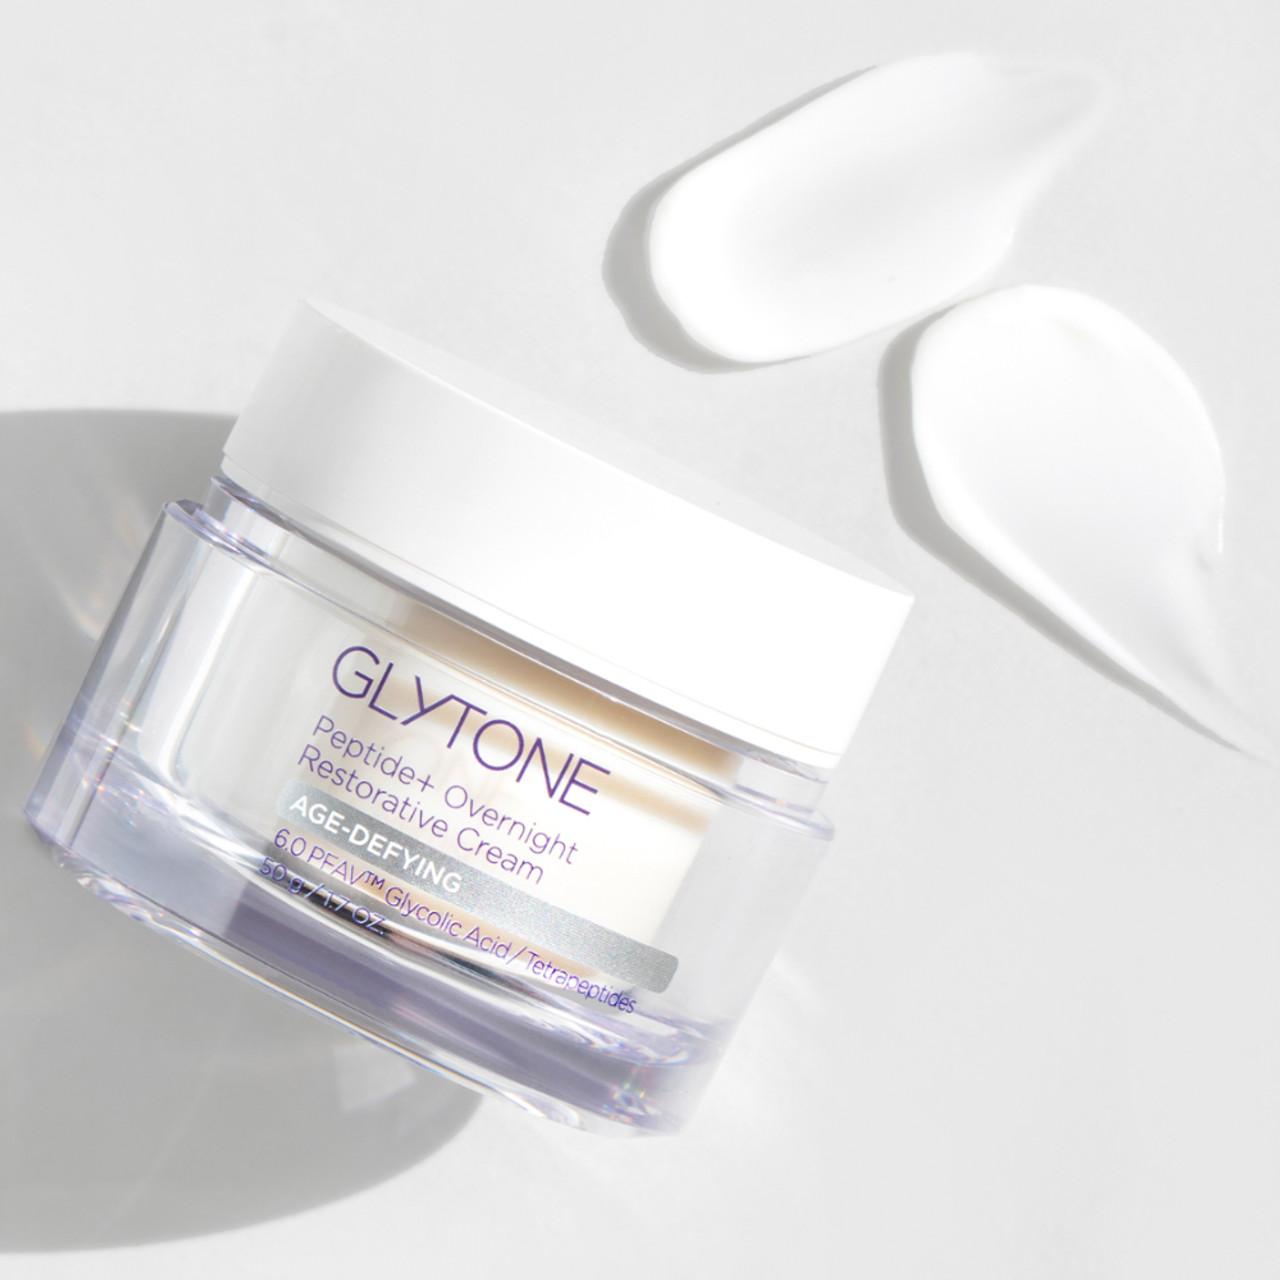 Glytone Age Defying Peptide+ Overnight Restorative Cream